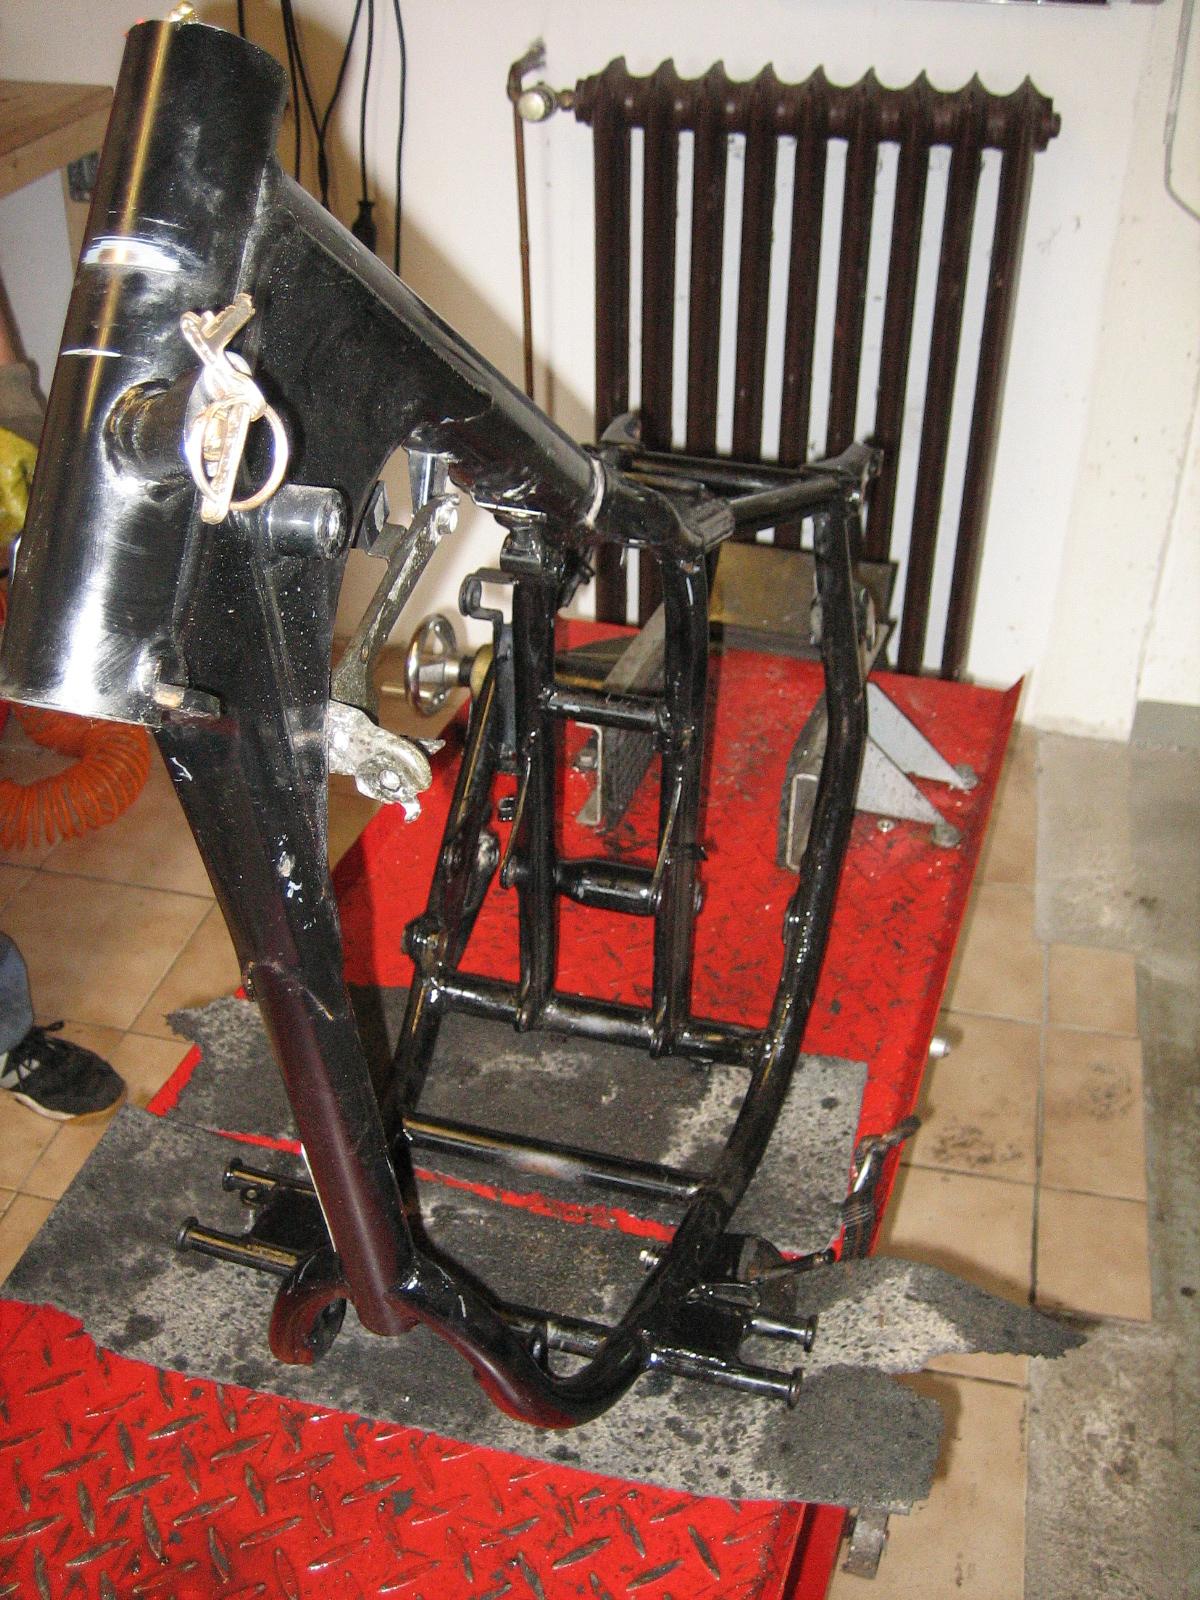 honda ca 125 rebel rahmen mit brief motorradteile berndorf. Black Bedroom Furniture Sets. Home Design Ideas